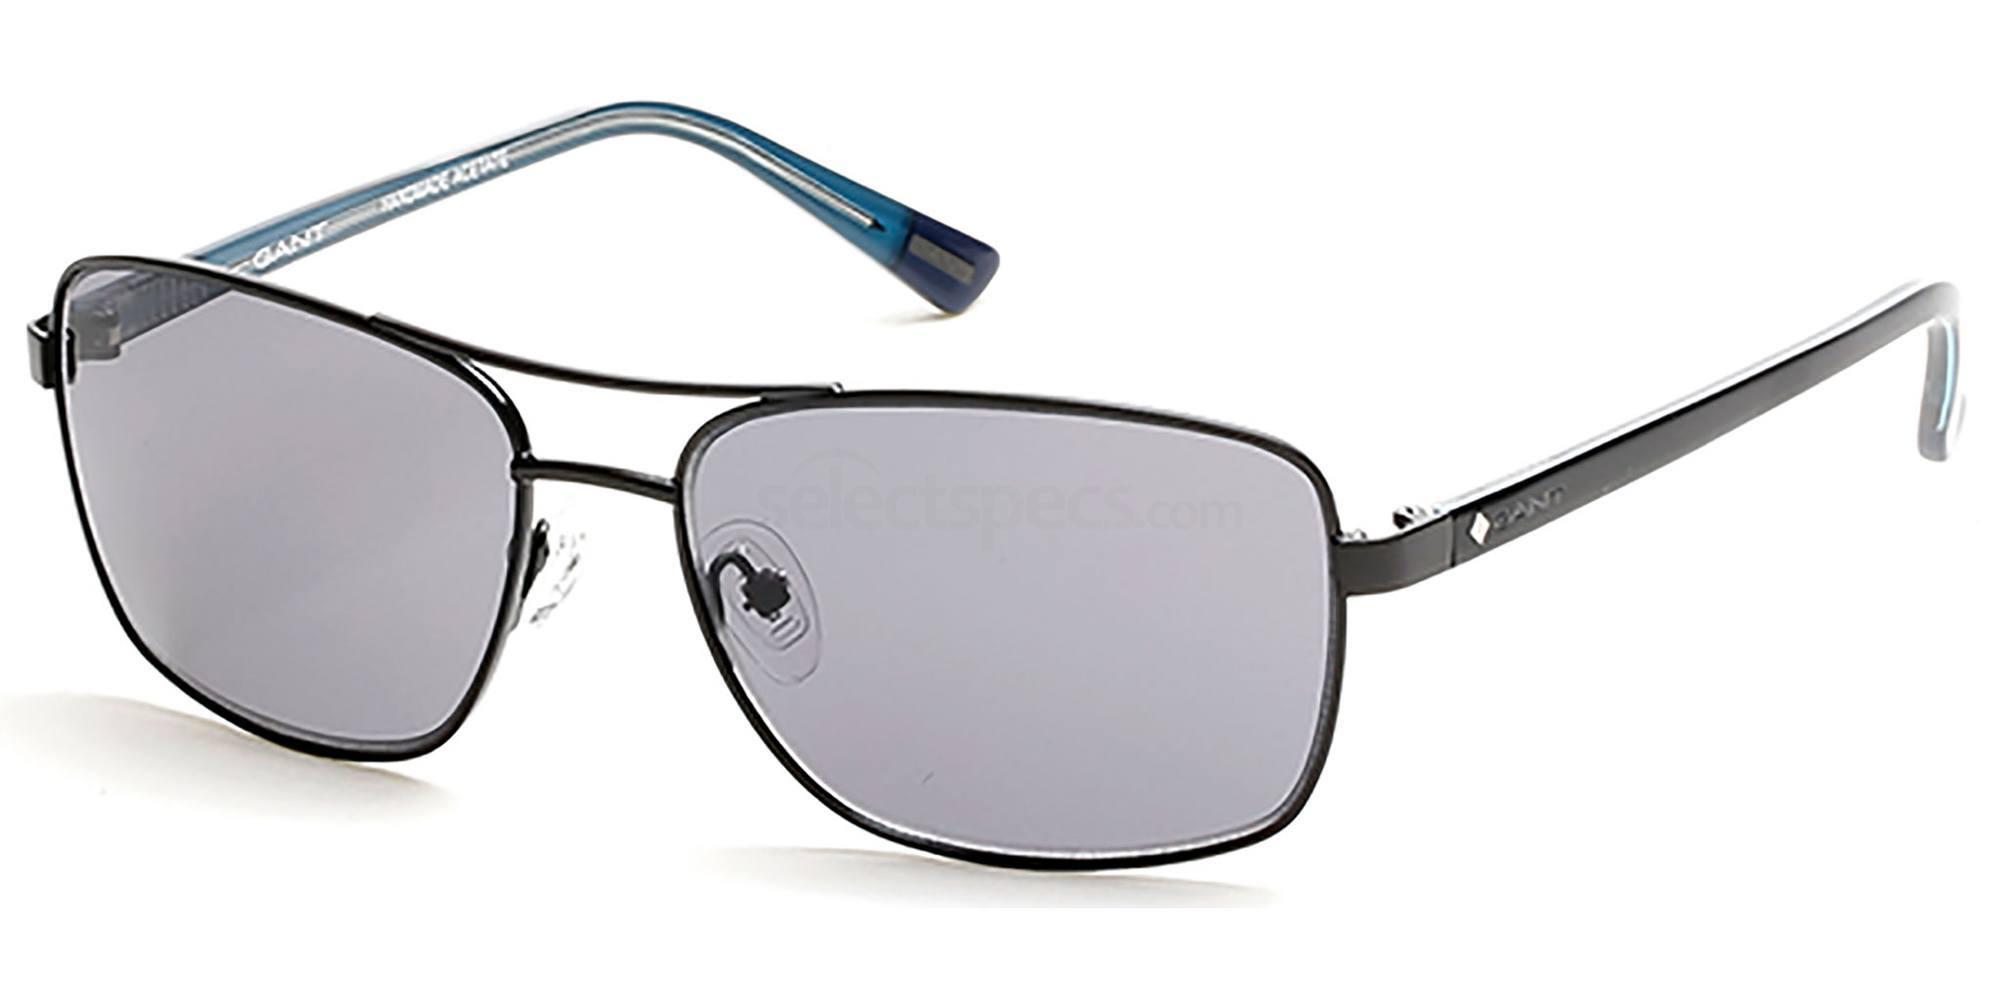 01A GA7063 Sunglasses, Gant